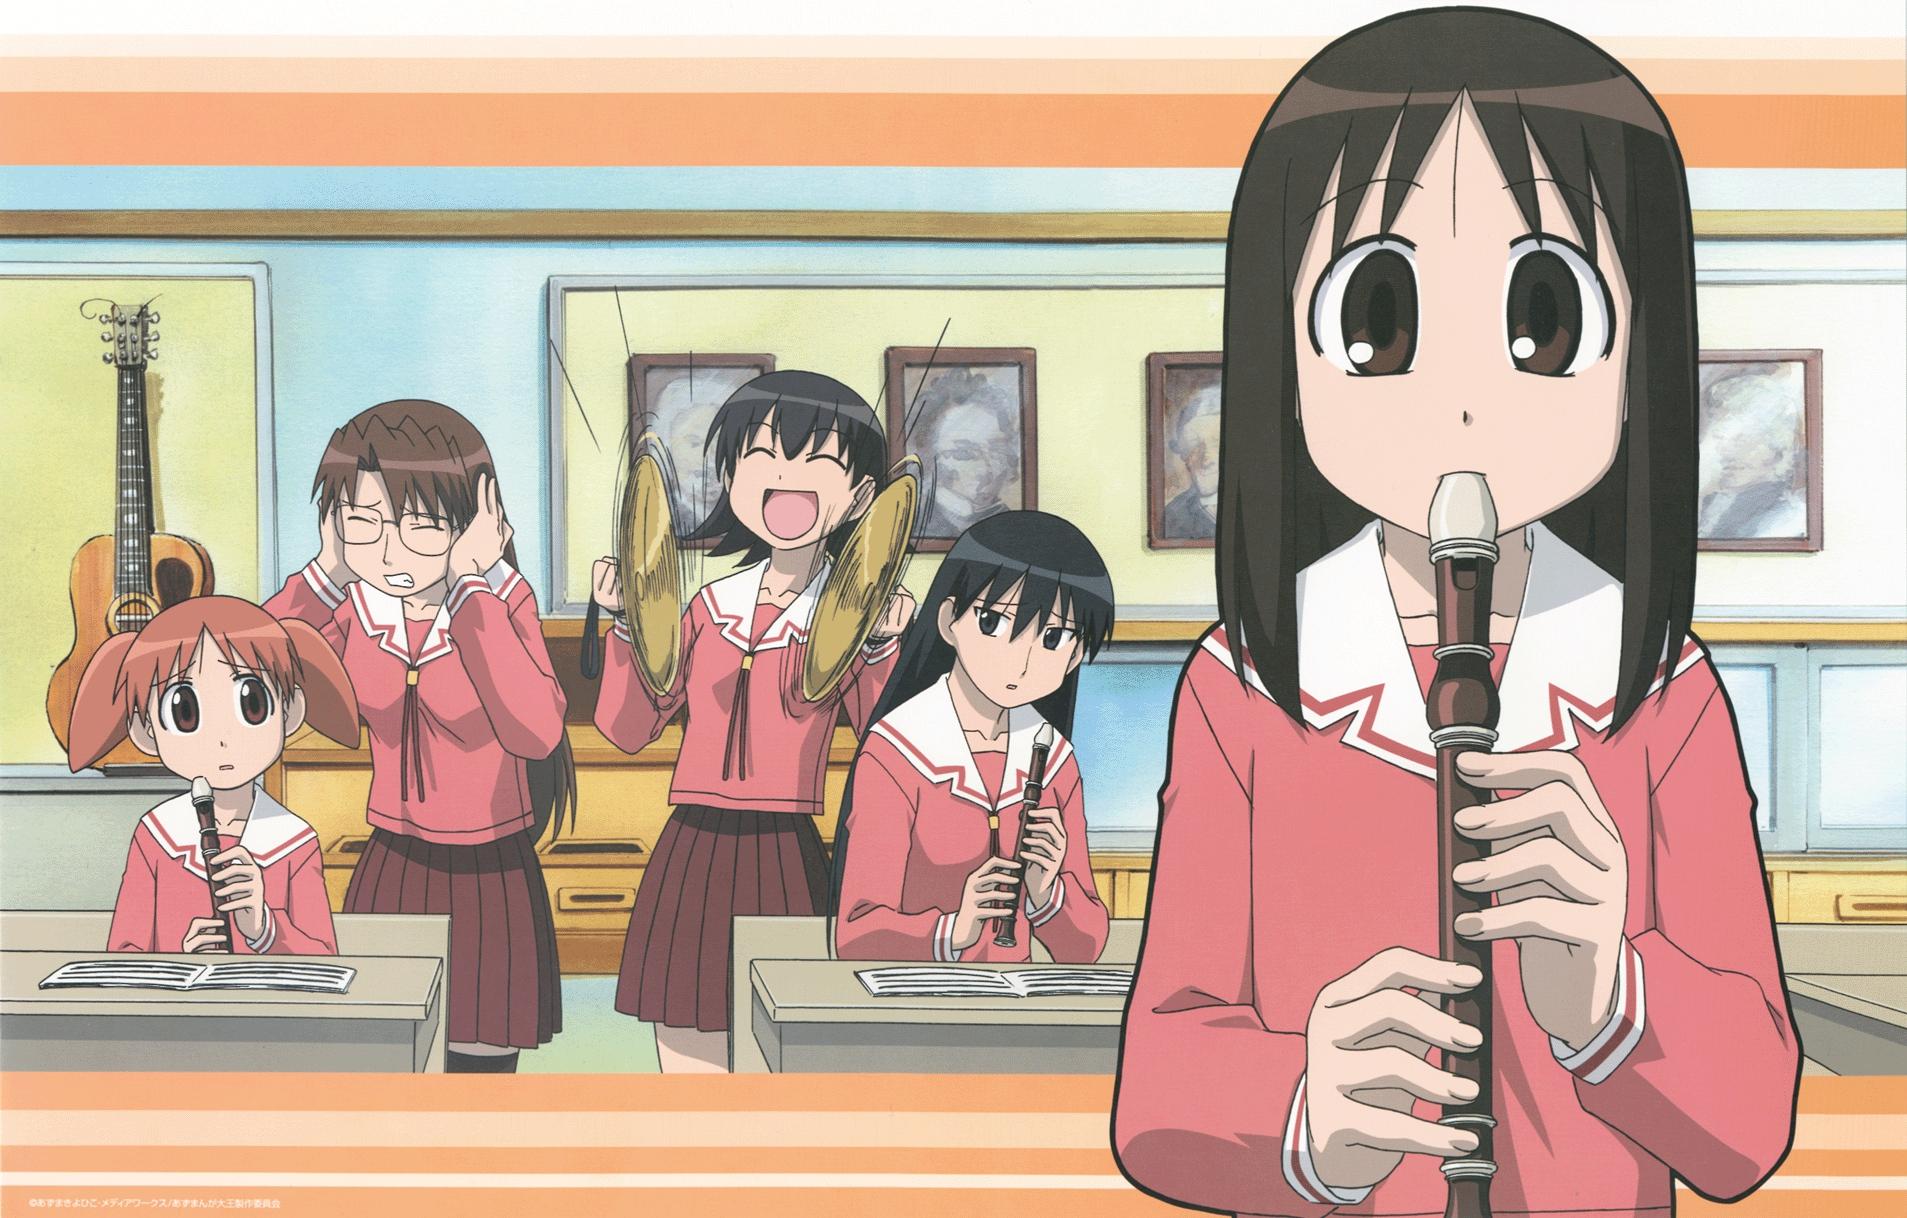 azumanga_daioh black_eyes black_hair group instrument kasuga_ayumu mihama_chiyo mizuhara_koyomi sakaki school_uniform takino_tomo